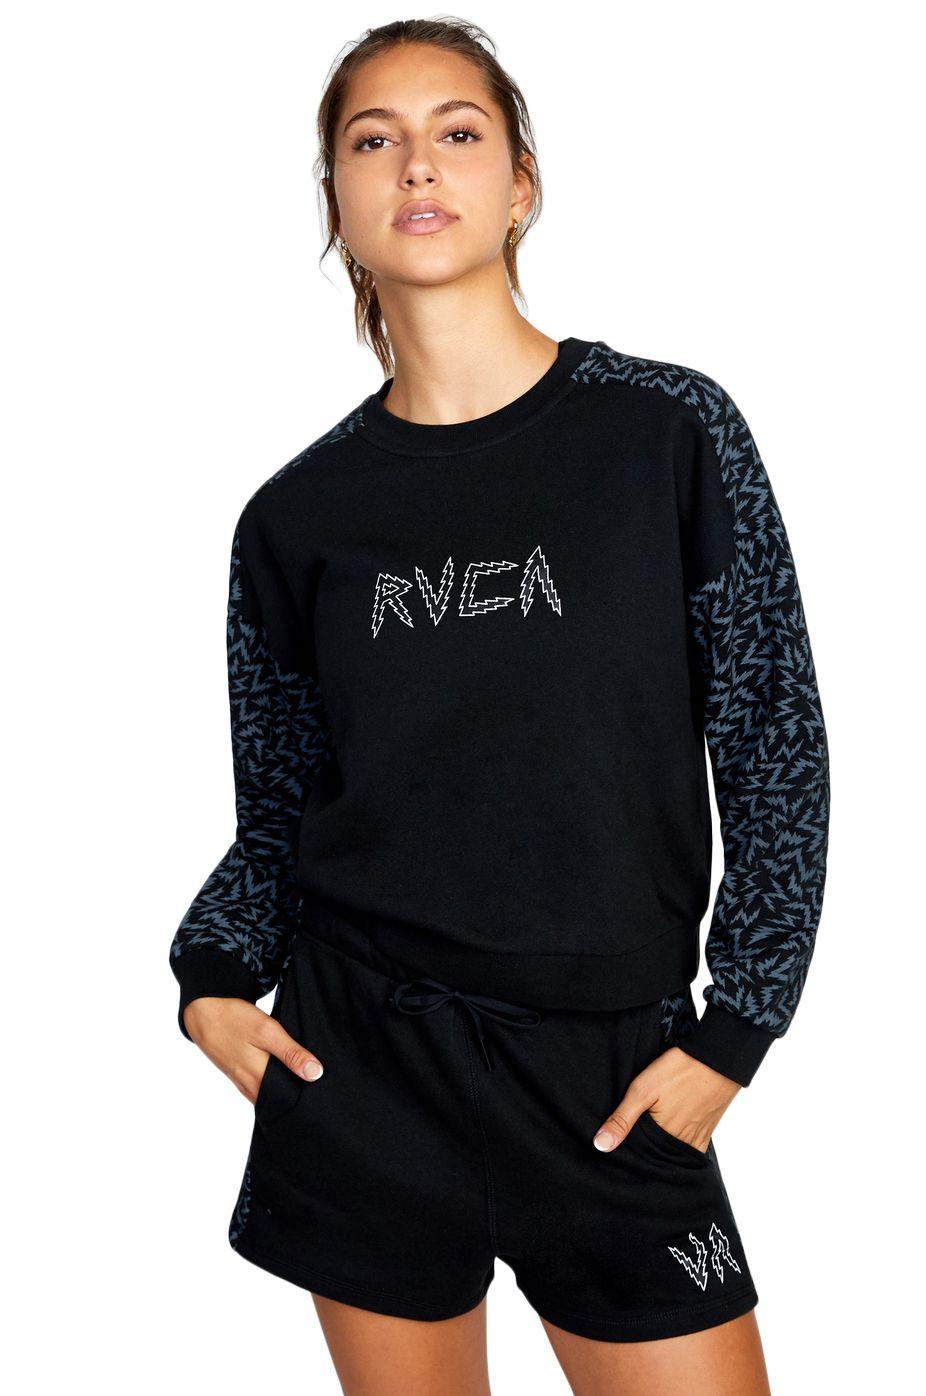 RVCA Crew Sweat LEINES HUSTLE CREWNE MATT LEINES Black